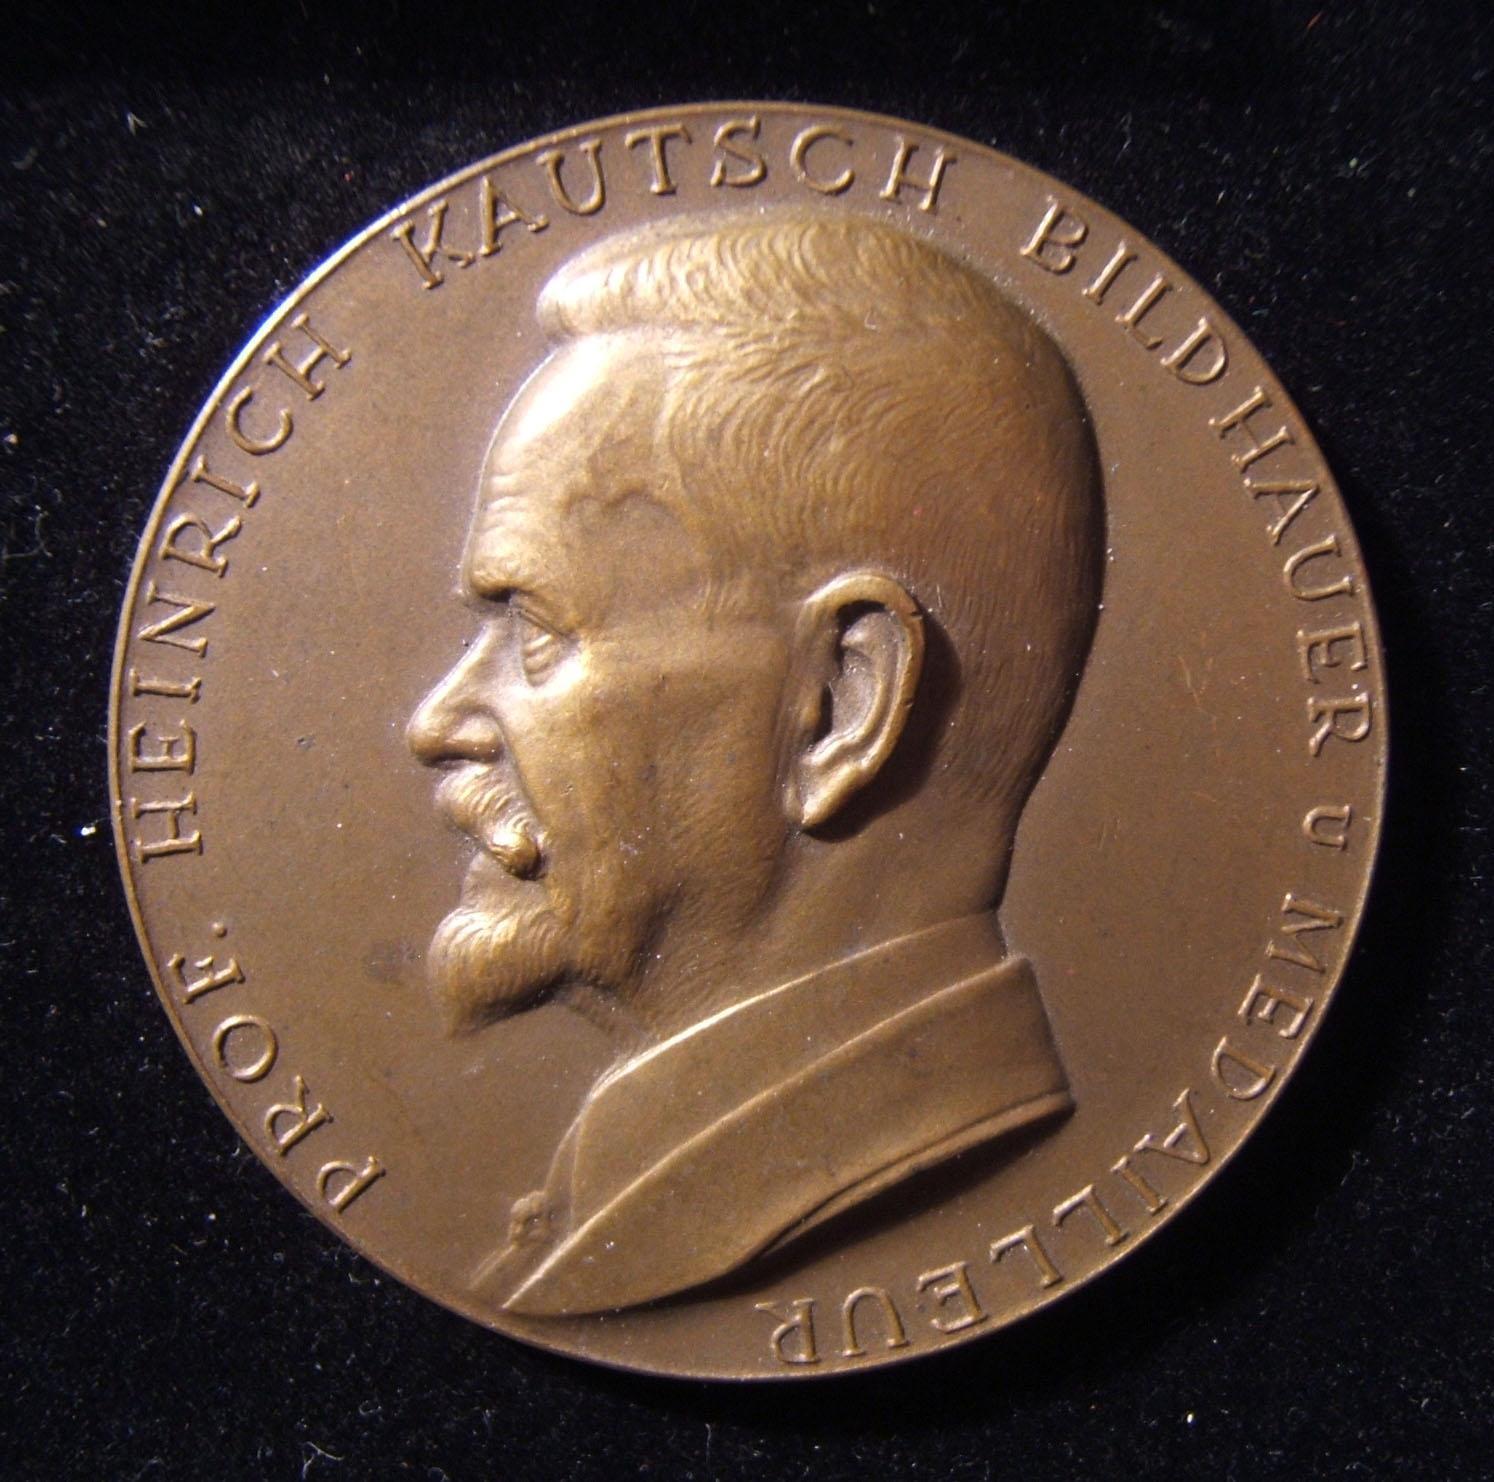 Austria: Professor Heinrich Kautsch bronze commemorative medal by Arnold Hartig, c. 1929; size: 52.5mm; weight: 58.4g. Obv.: left-facing Kautsch; Ger. leg.